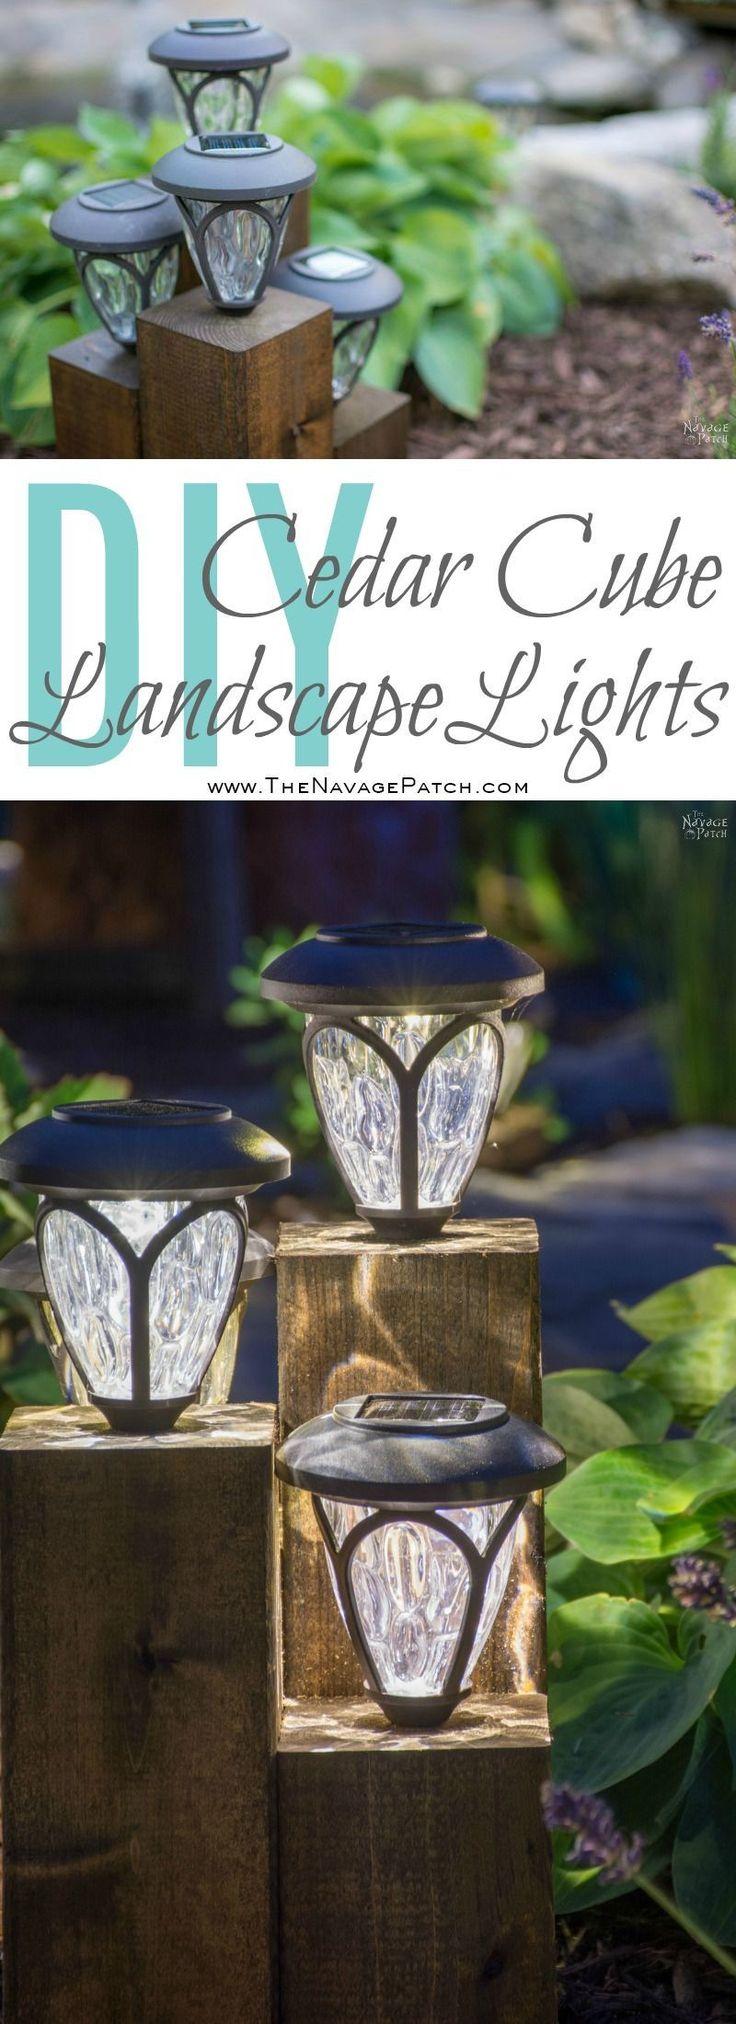 Outdoor living design ideas amp inspiration gallery install it direct - Diy Cedar Cube Landscape Lights